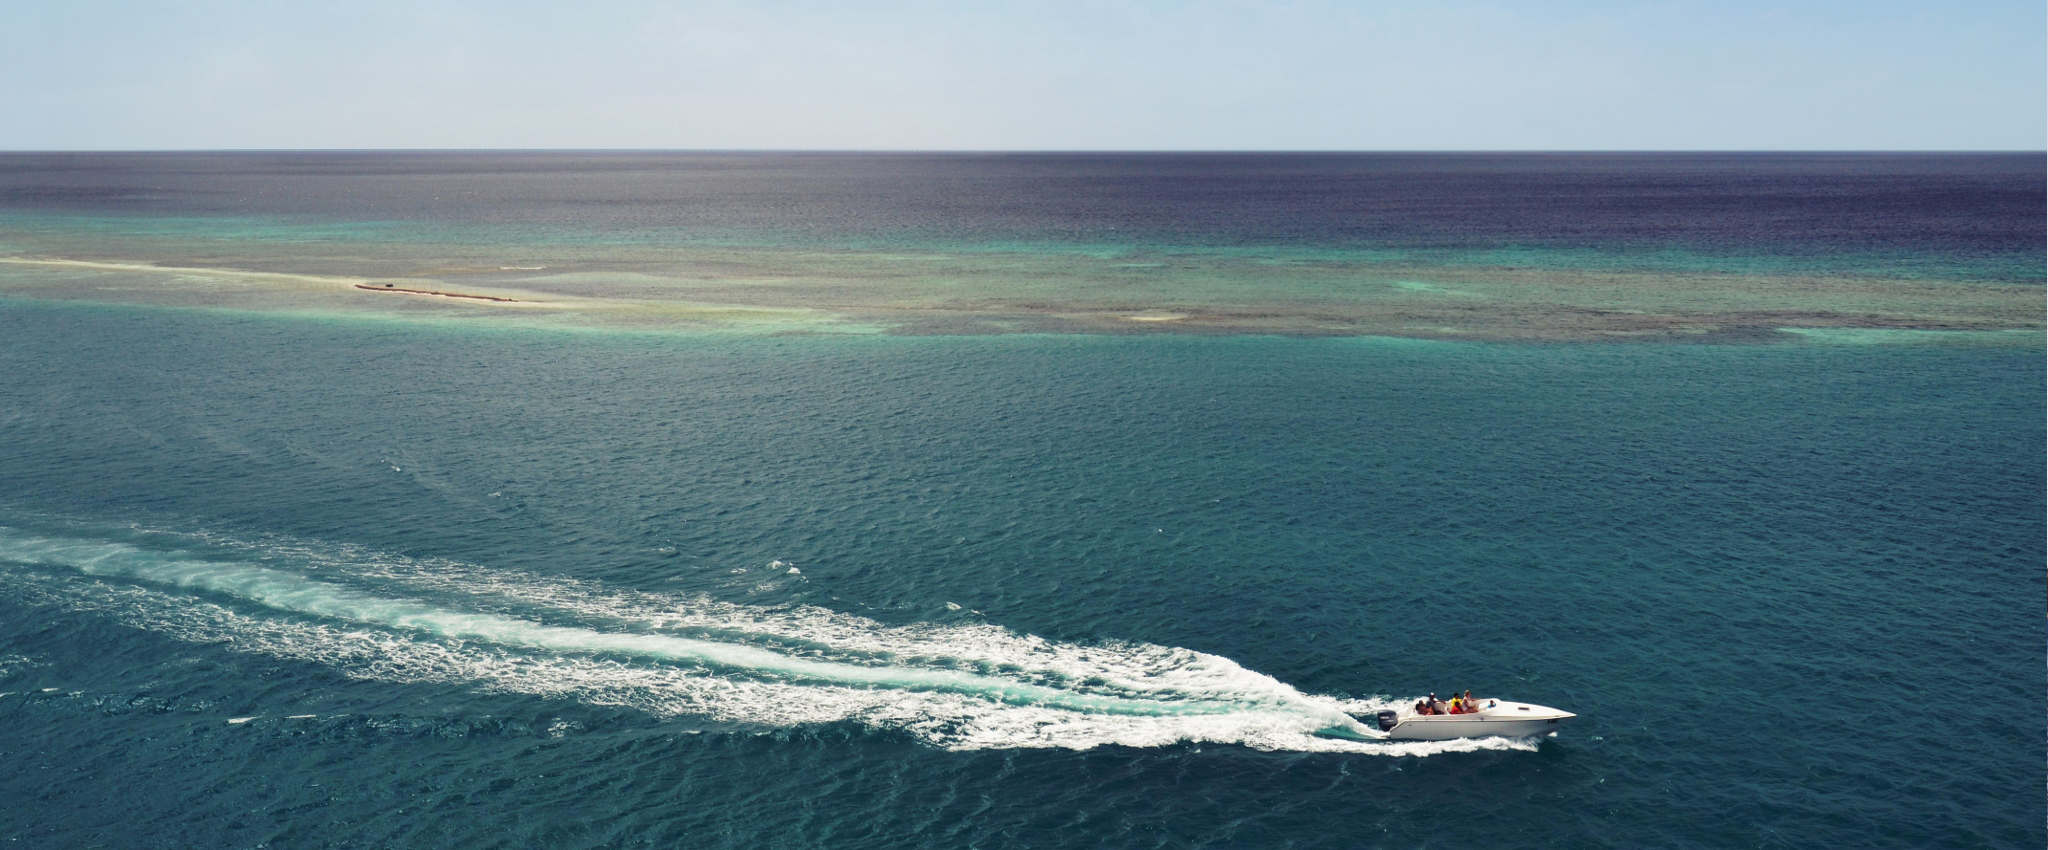 Motorboot mieten an der Costa de la Luz